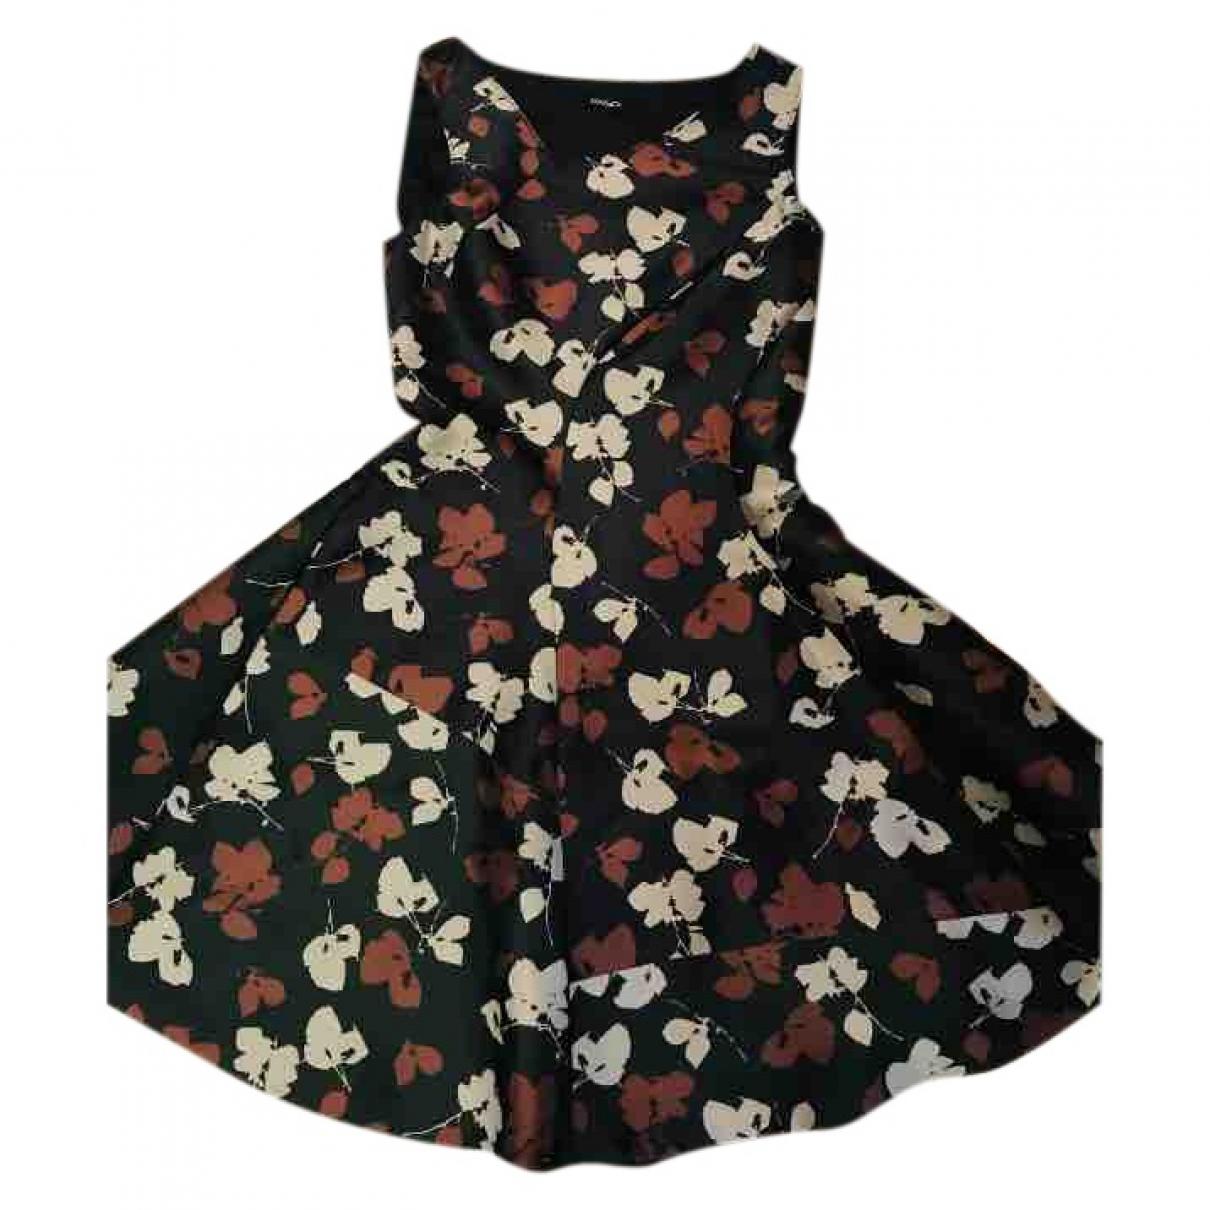 Max & Co \N Green dress for Women 38 IT